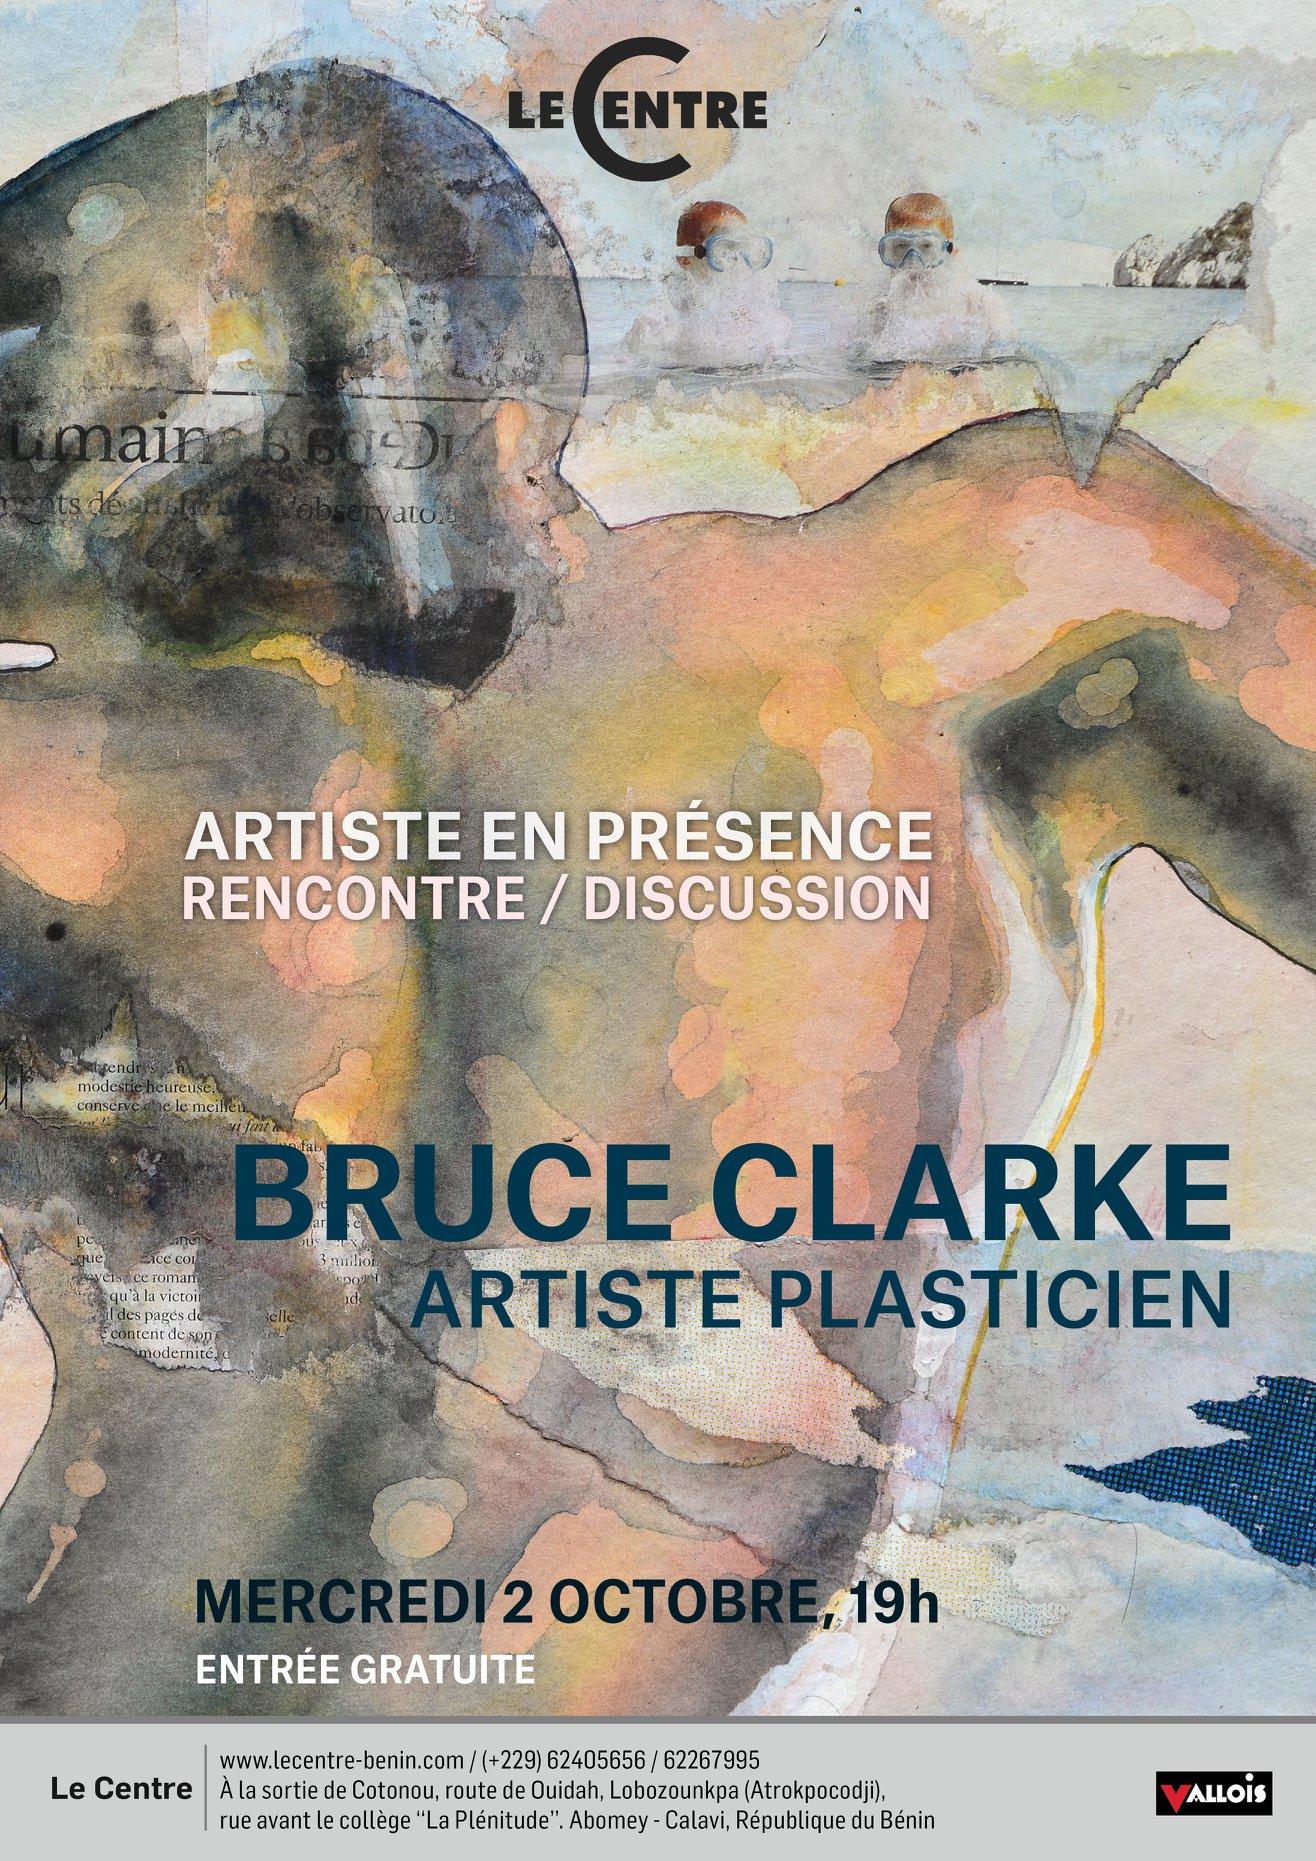 Artiste en présence, Bruce Clarke